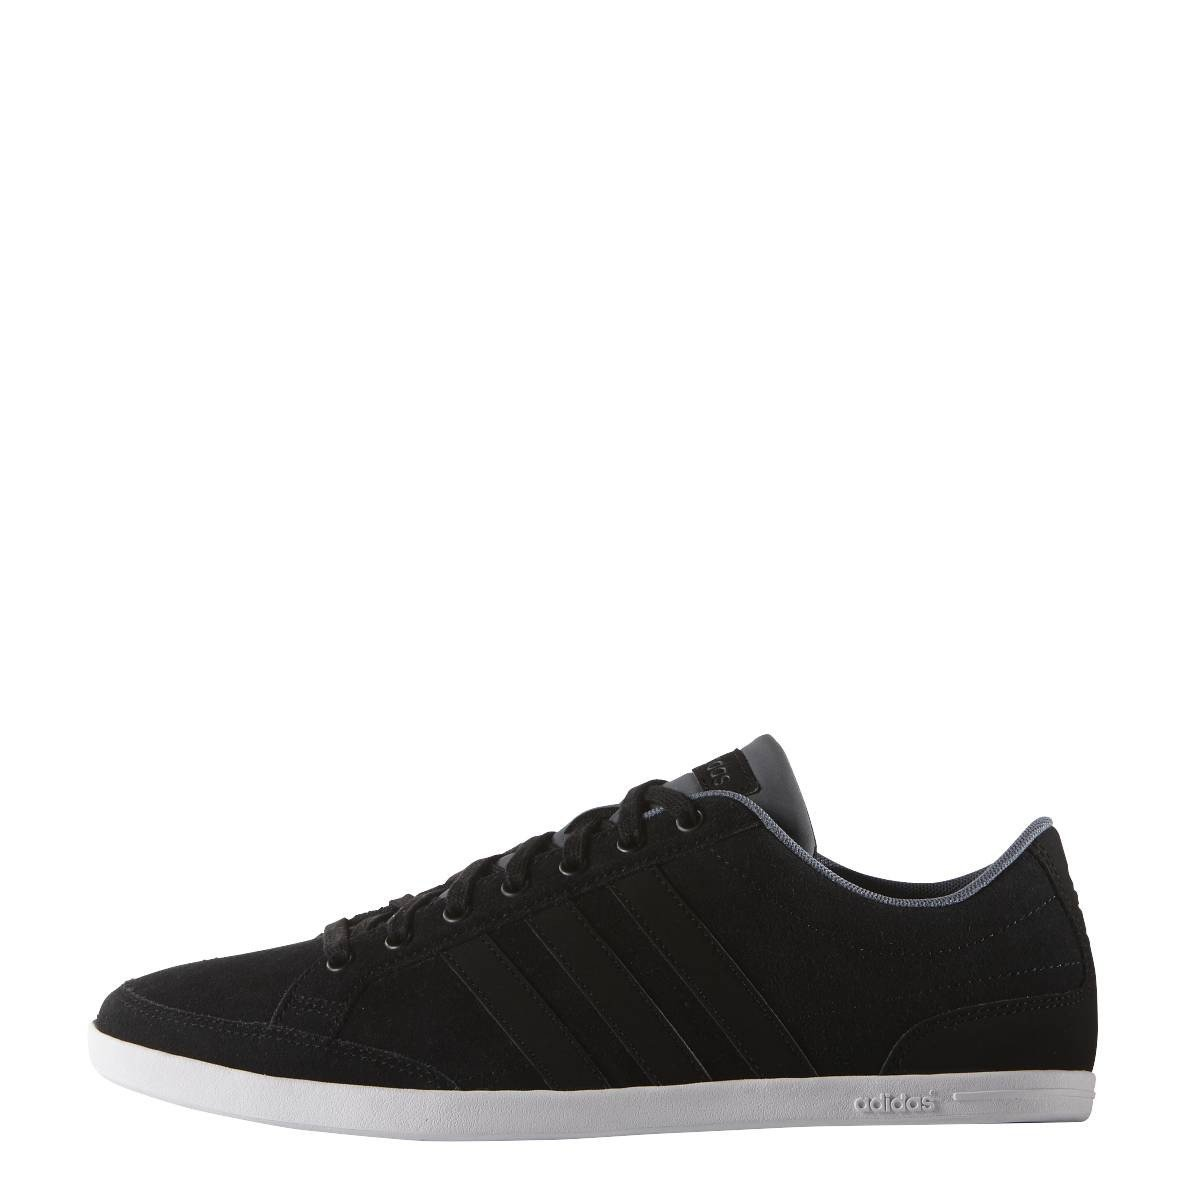 Adidas Freizeit Adidas Caflaire Schuh B43742 ( Grau )